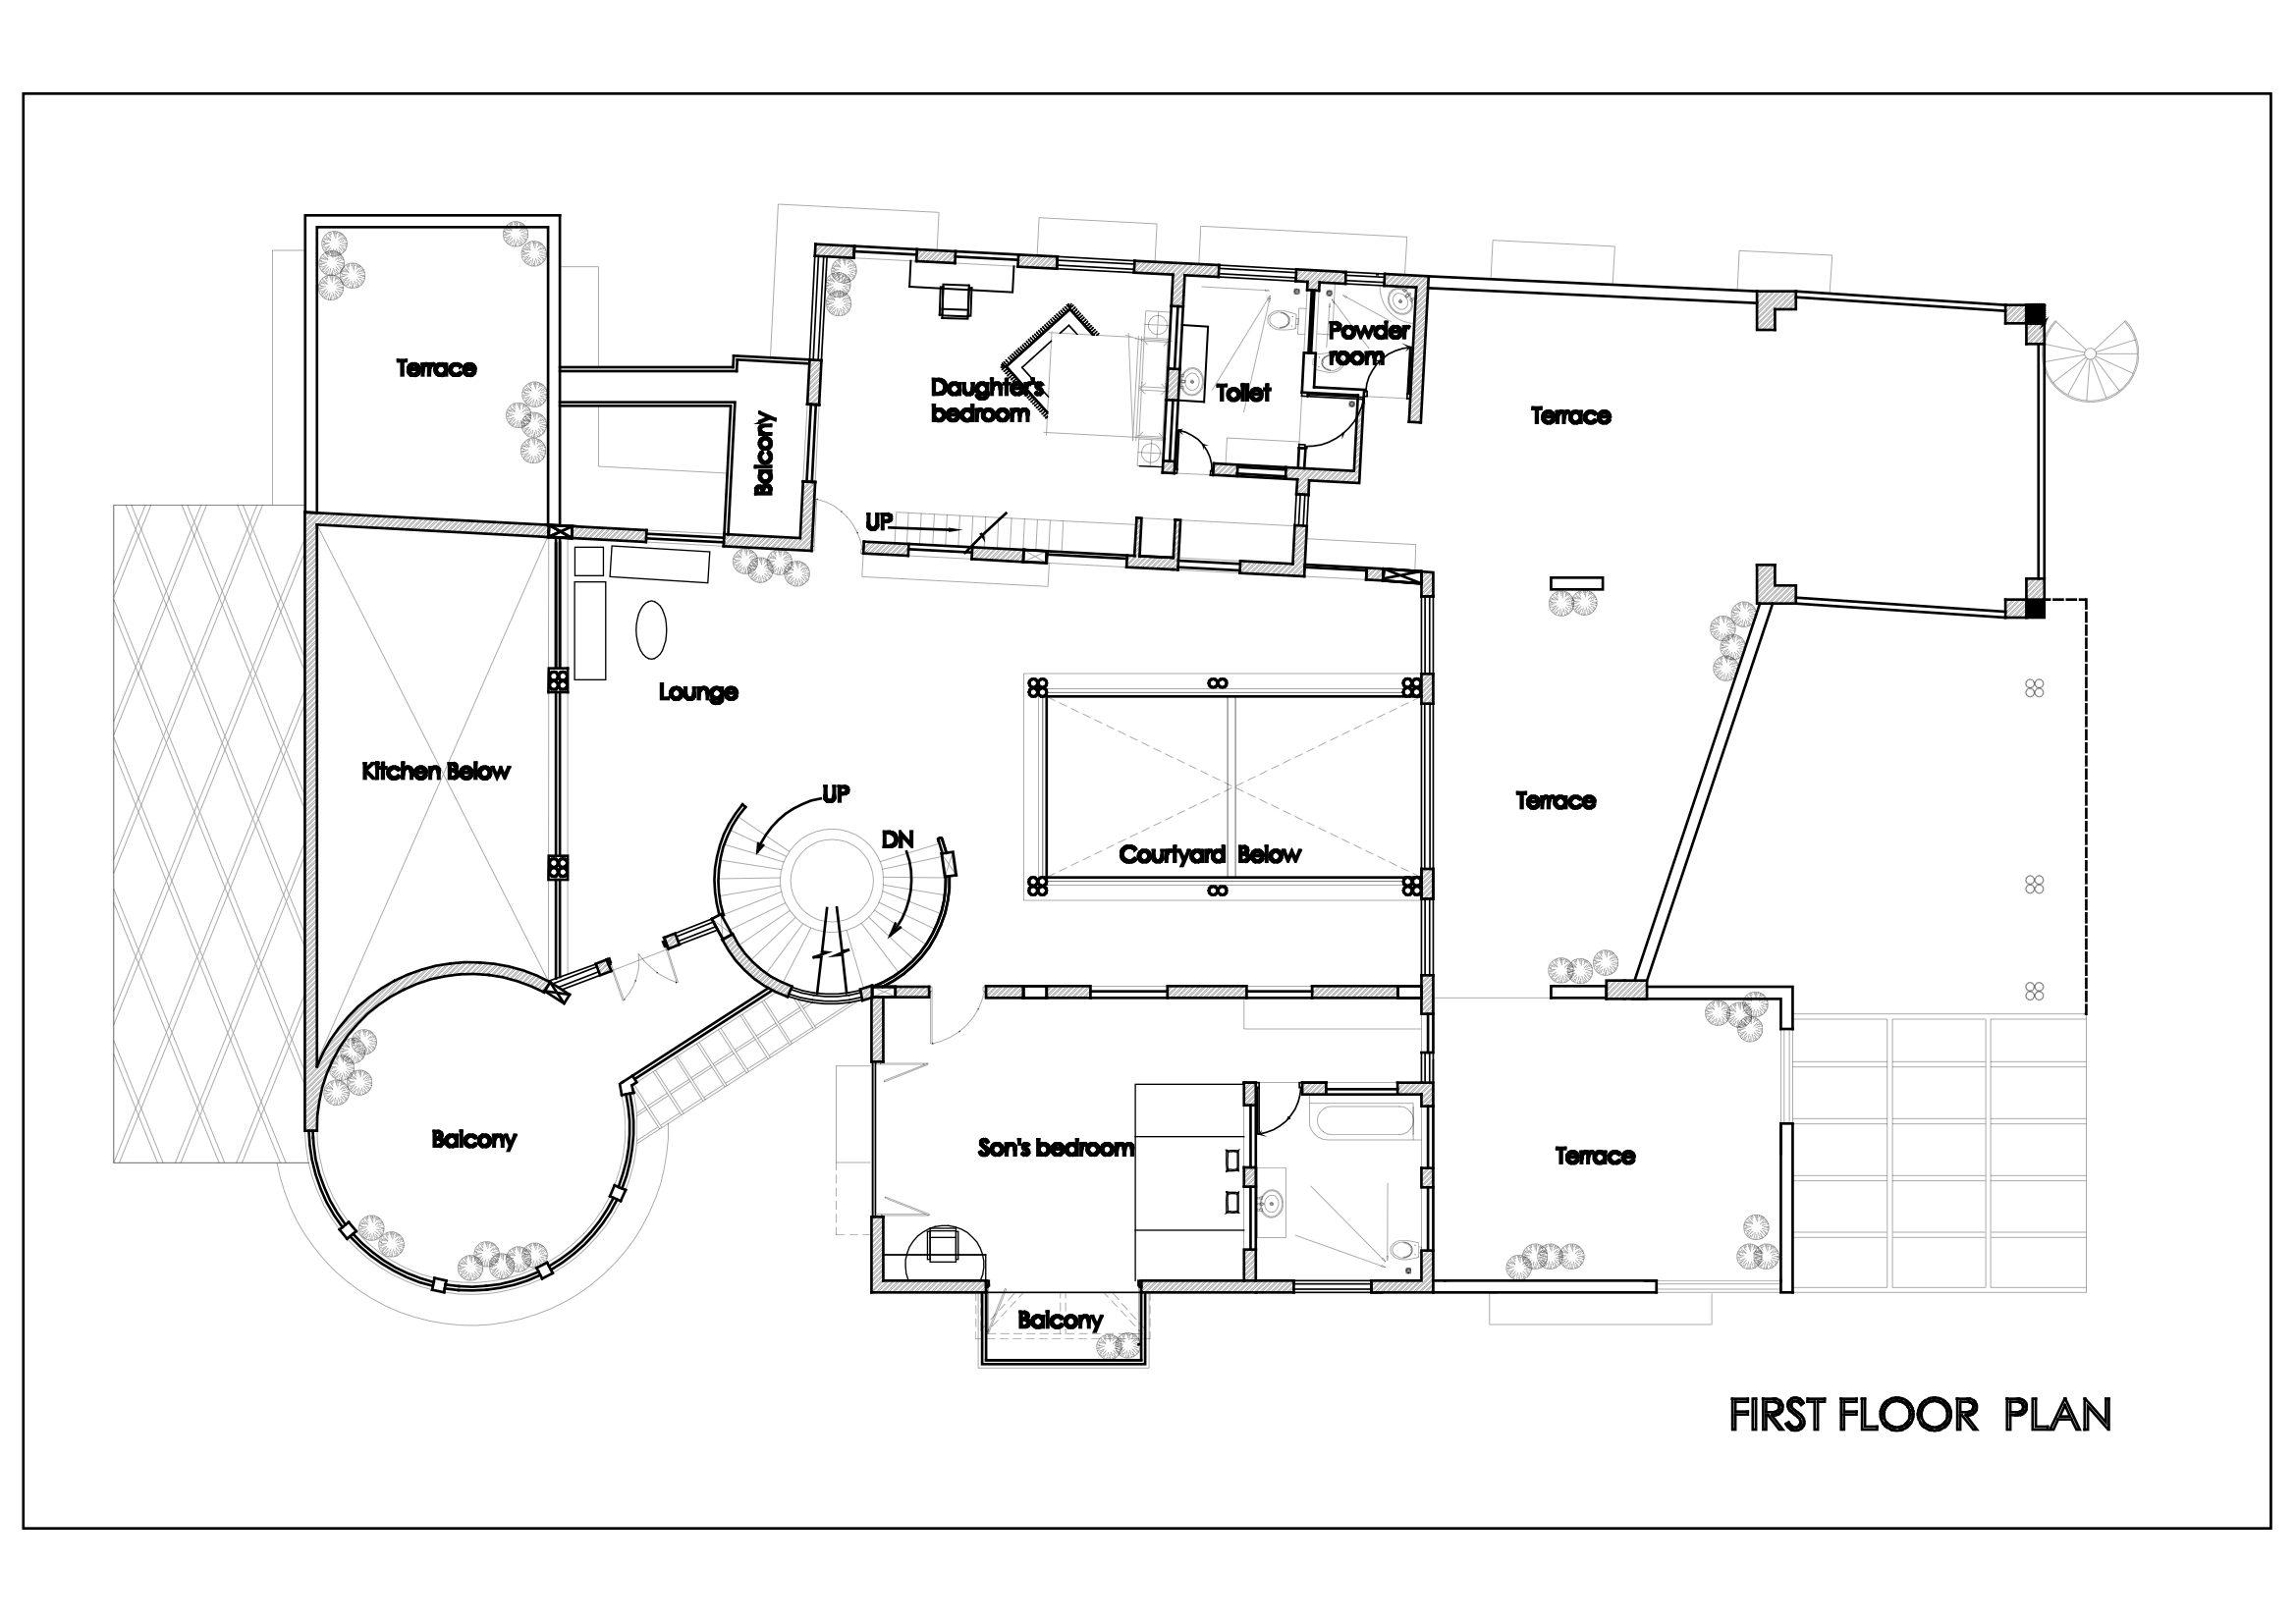 House of Five Elements - Manasaram Architects 5